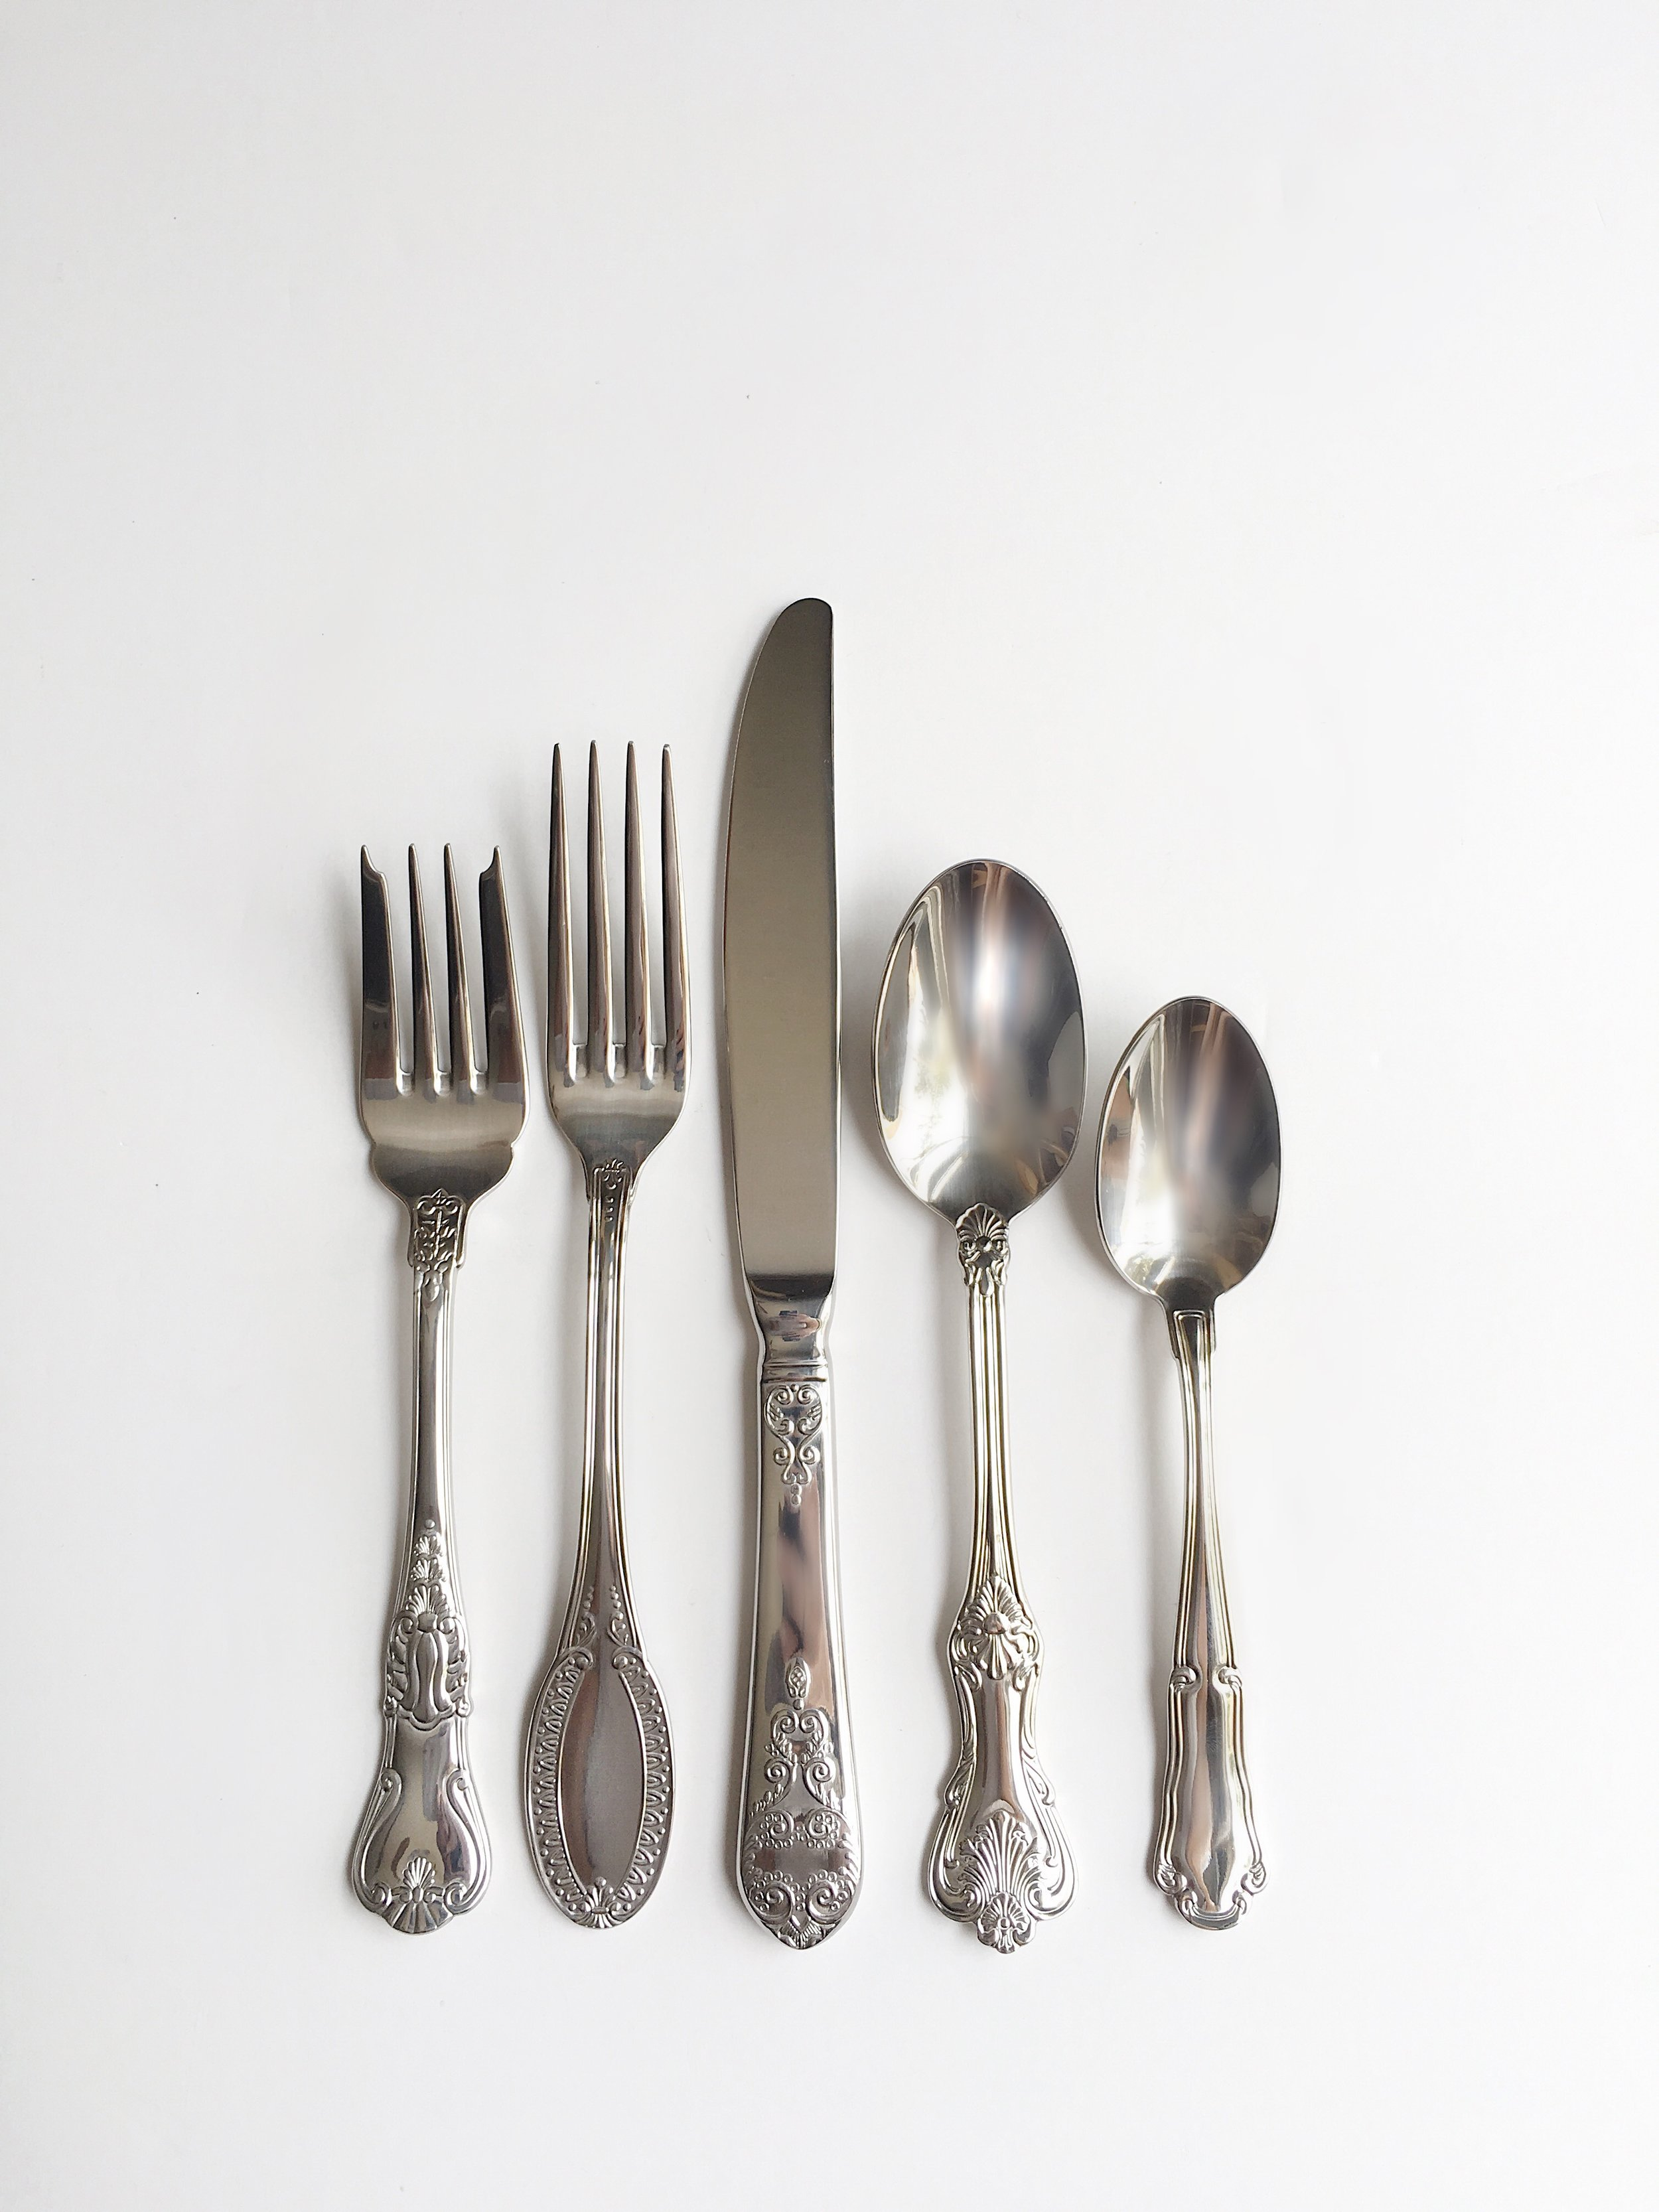 Embossed Vintage Silver+THEMIXDISH.JPG